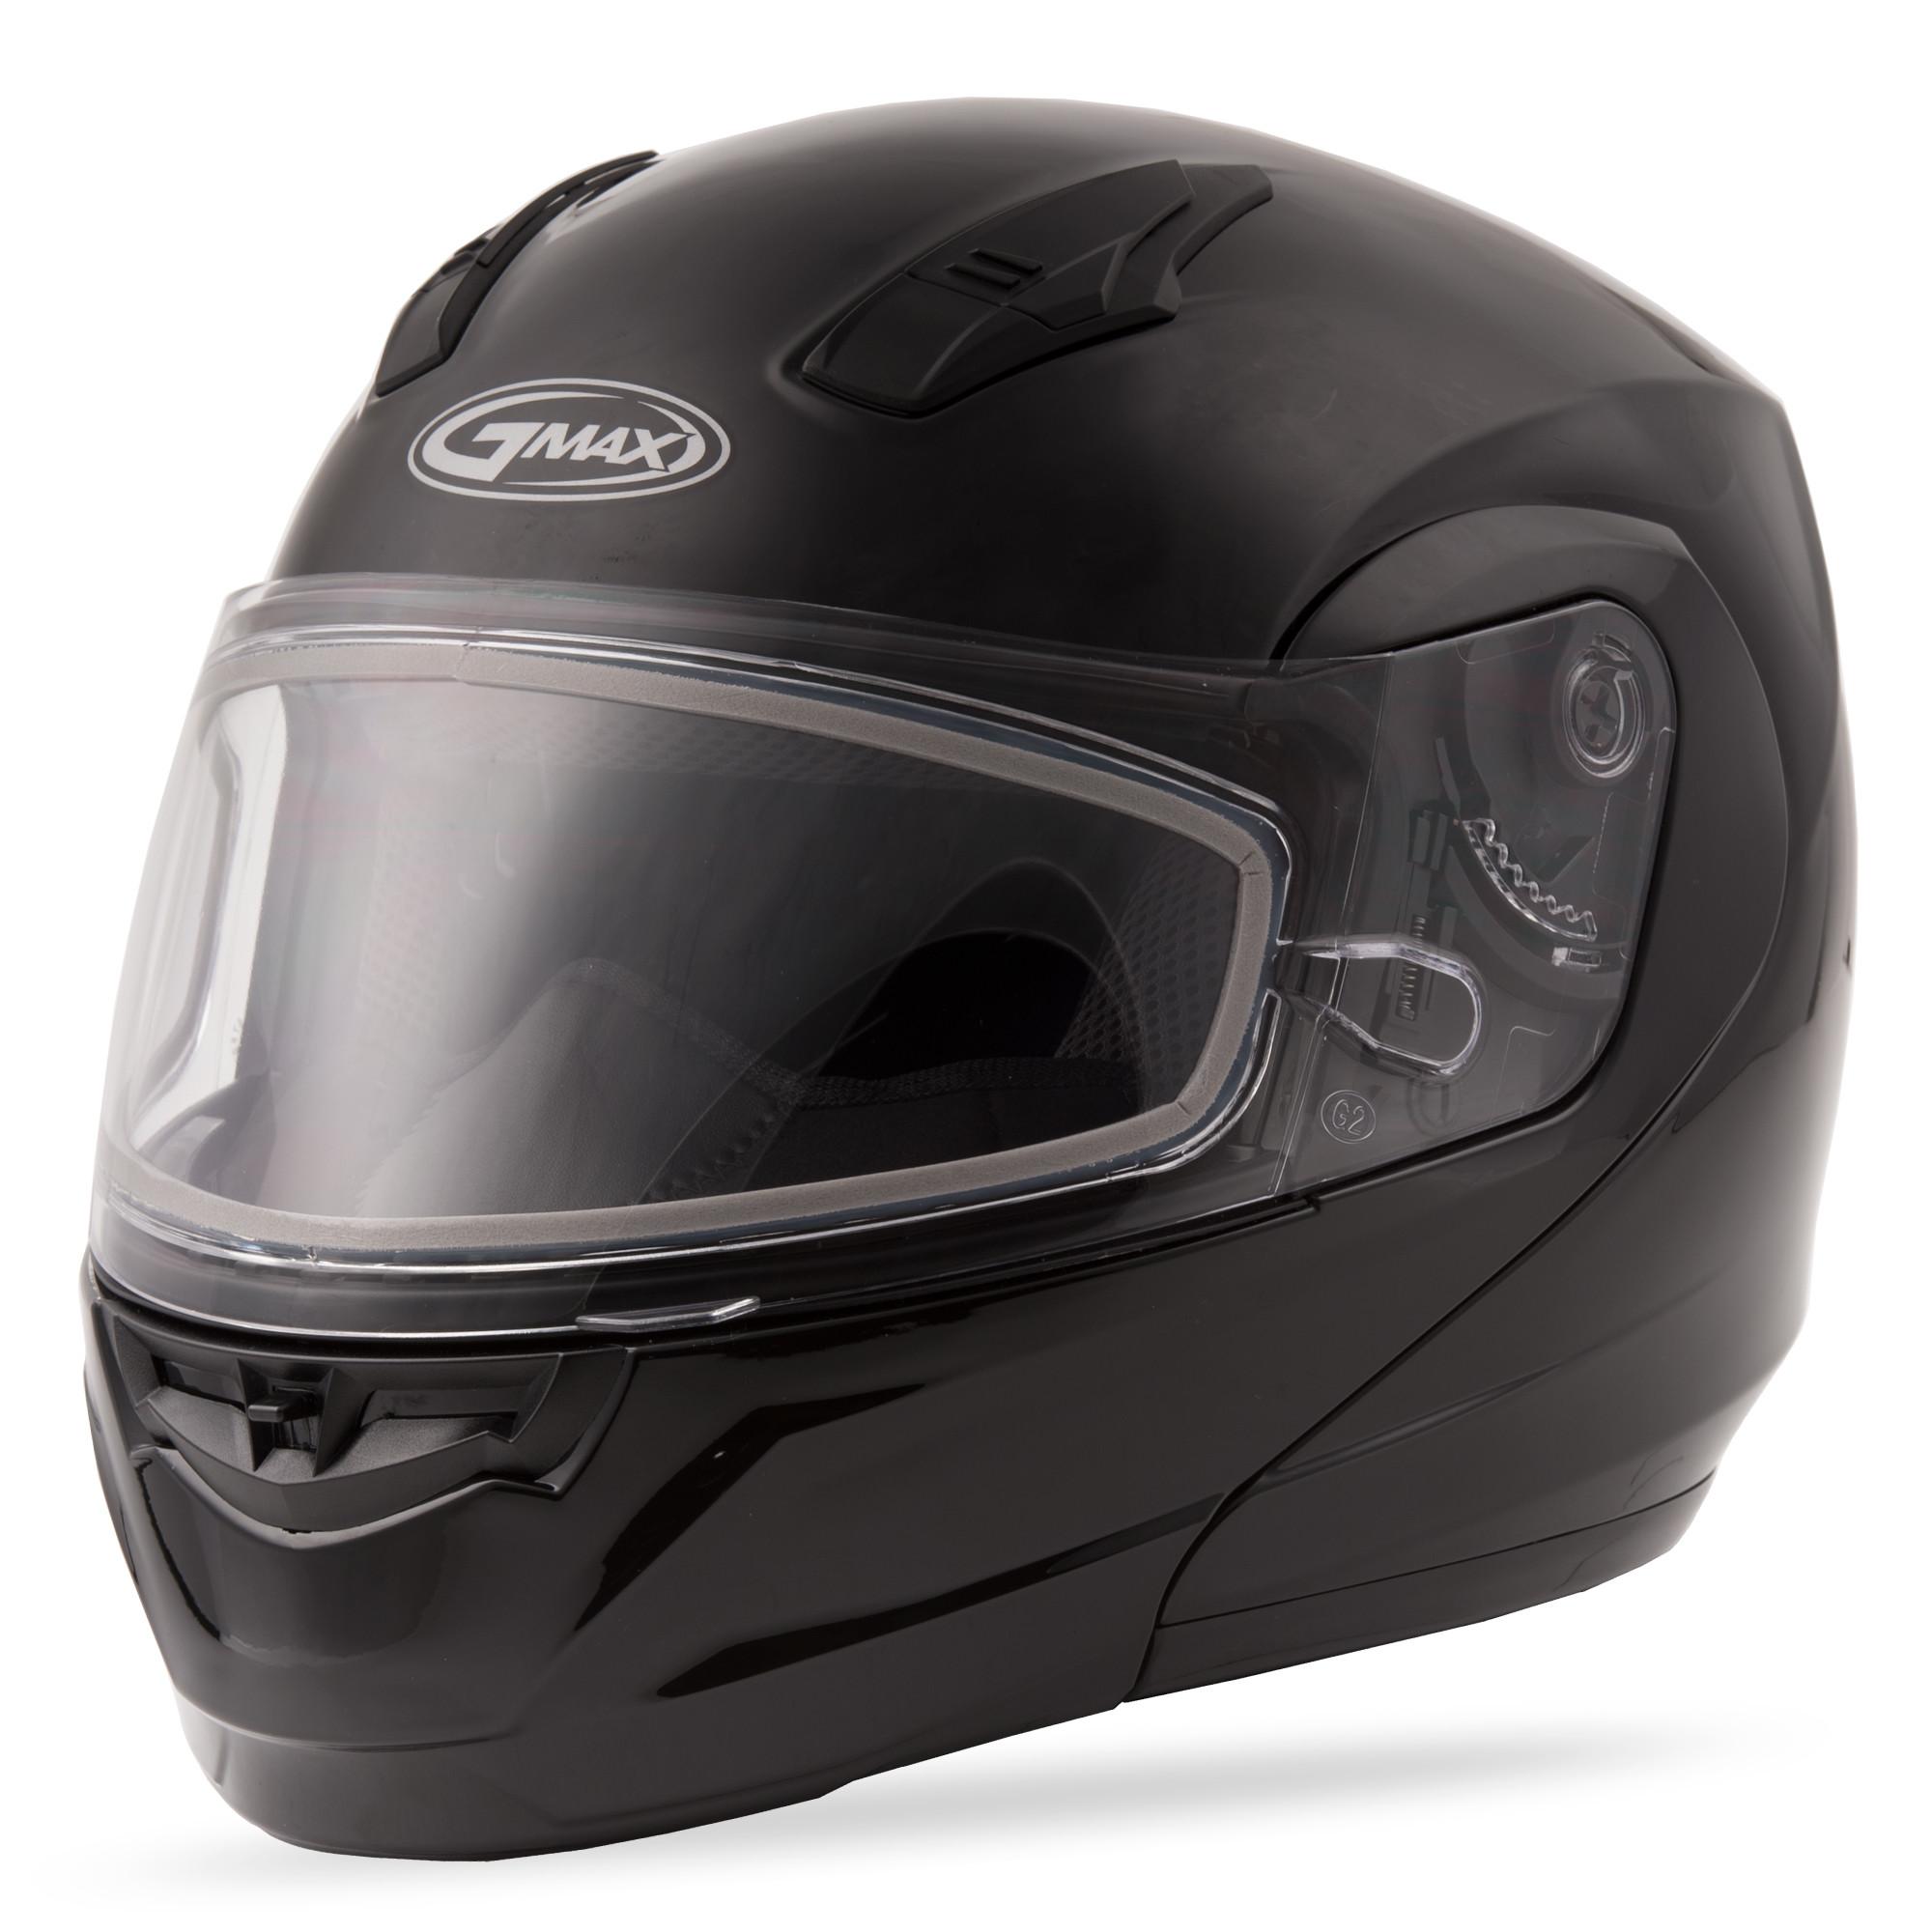 MD-04S Snow Helmet Solid